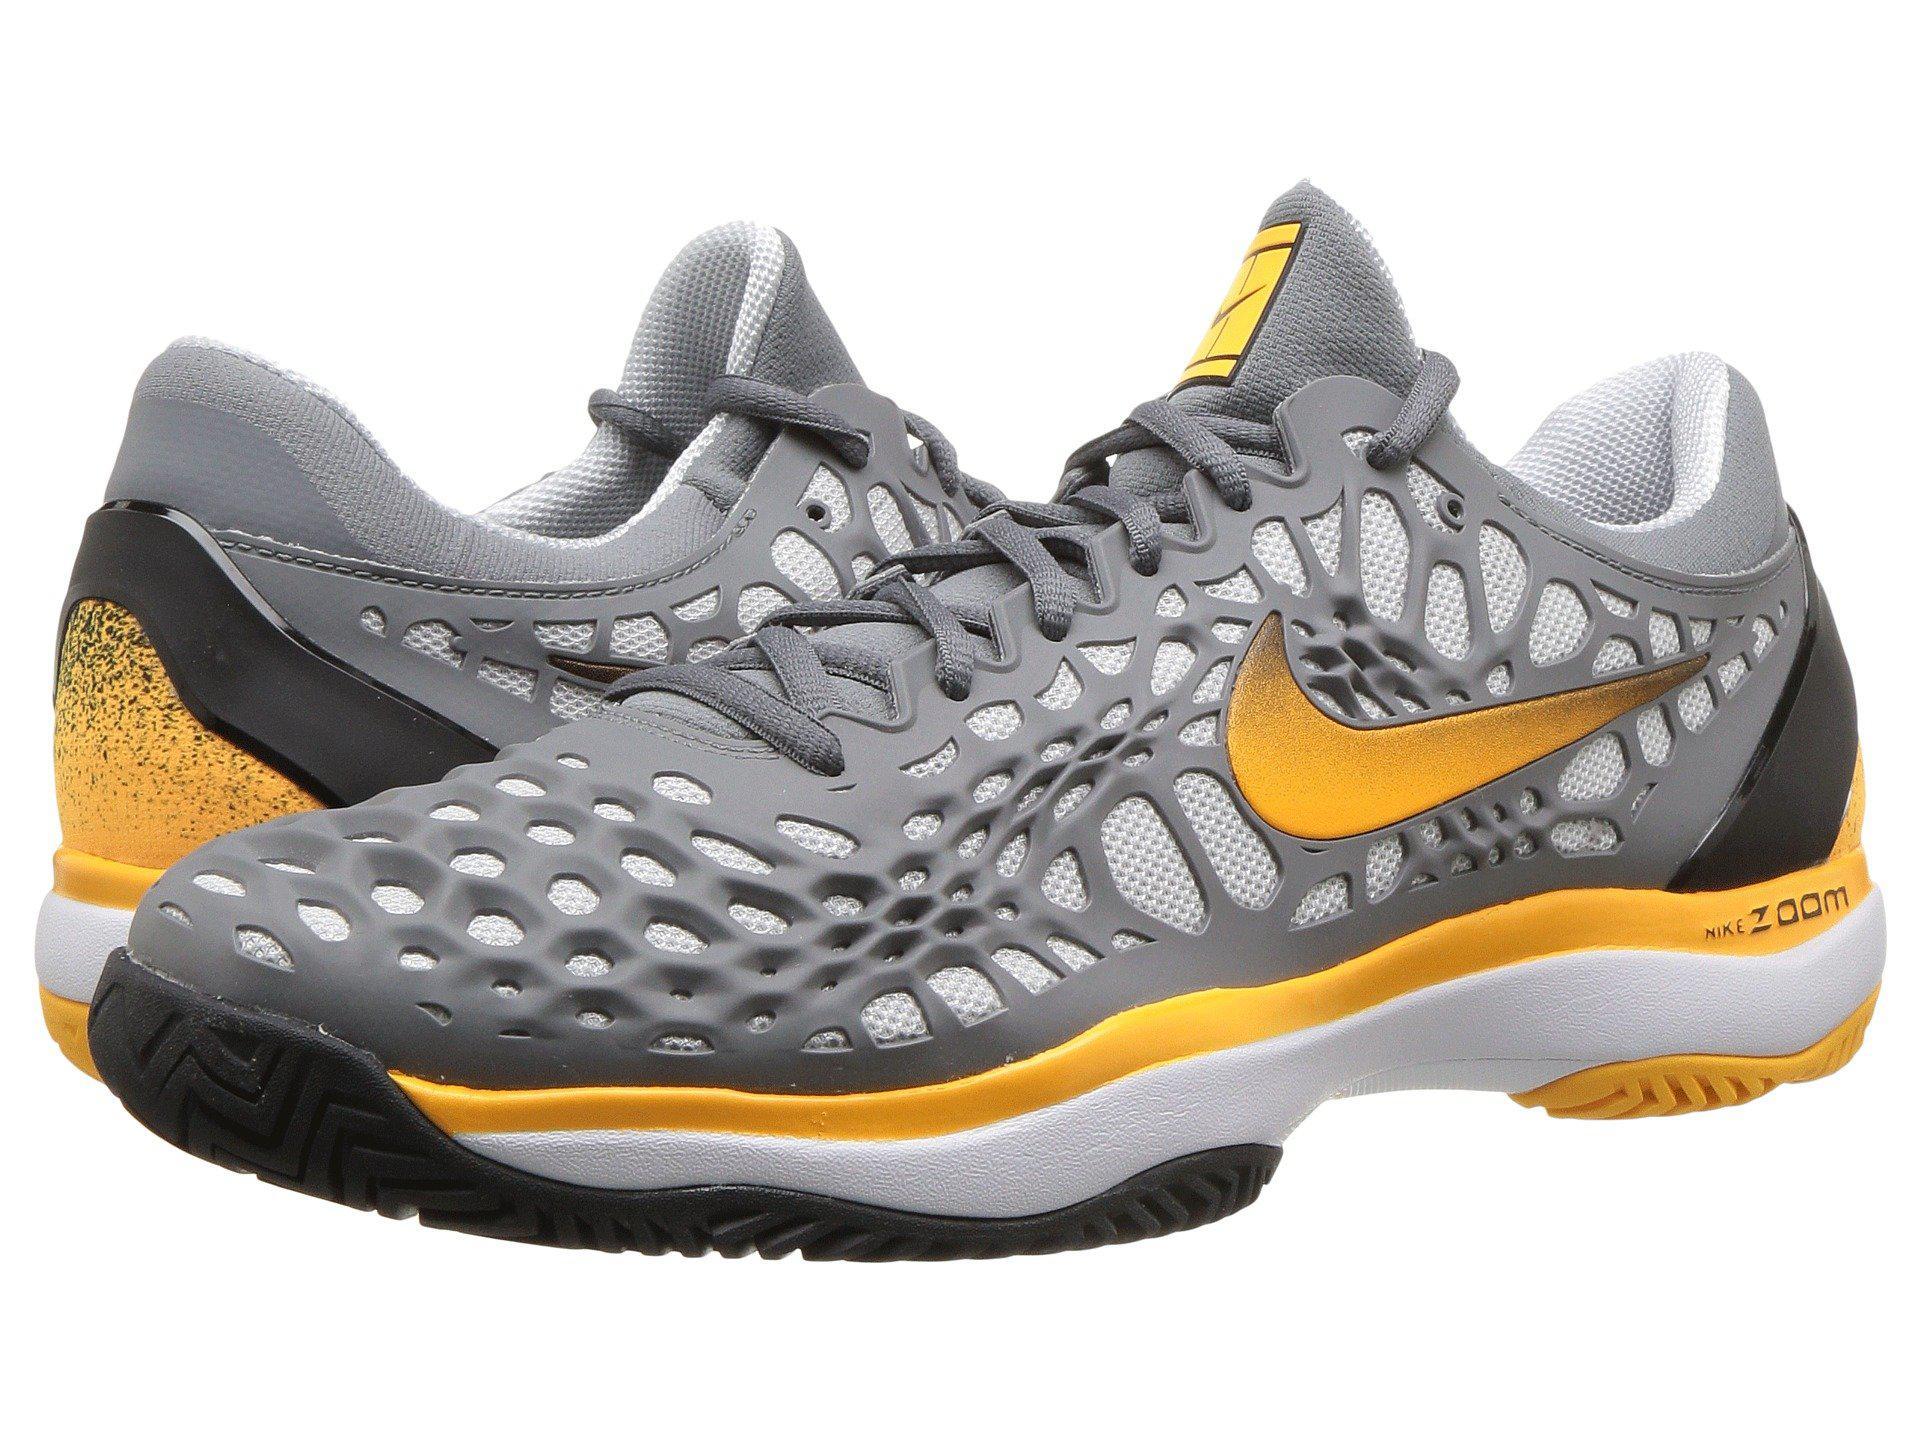 85a73b6e16650c de tenis Nike Zappos Cage Zapatillas UYdyw5qTd